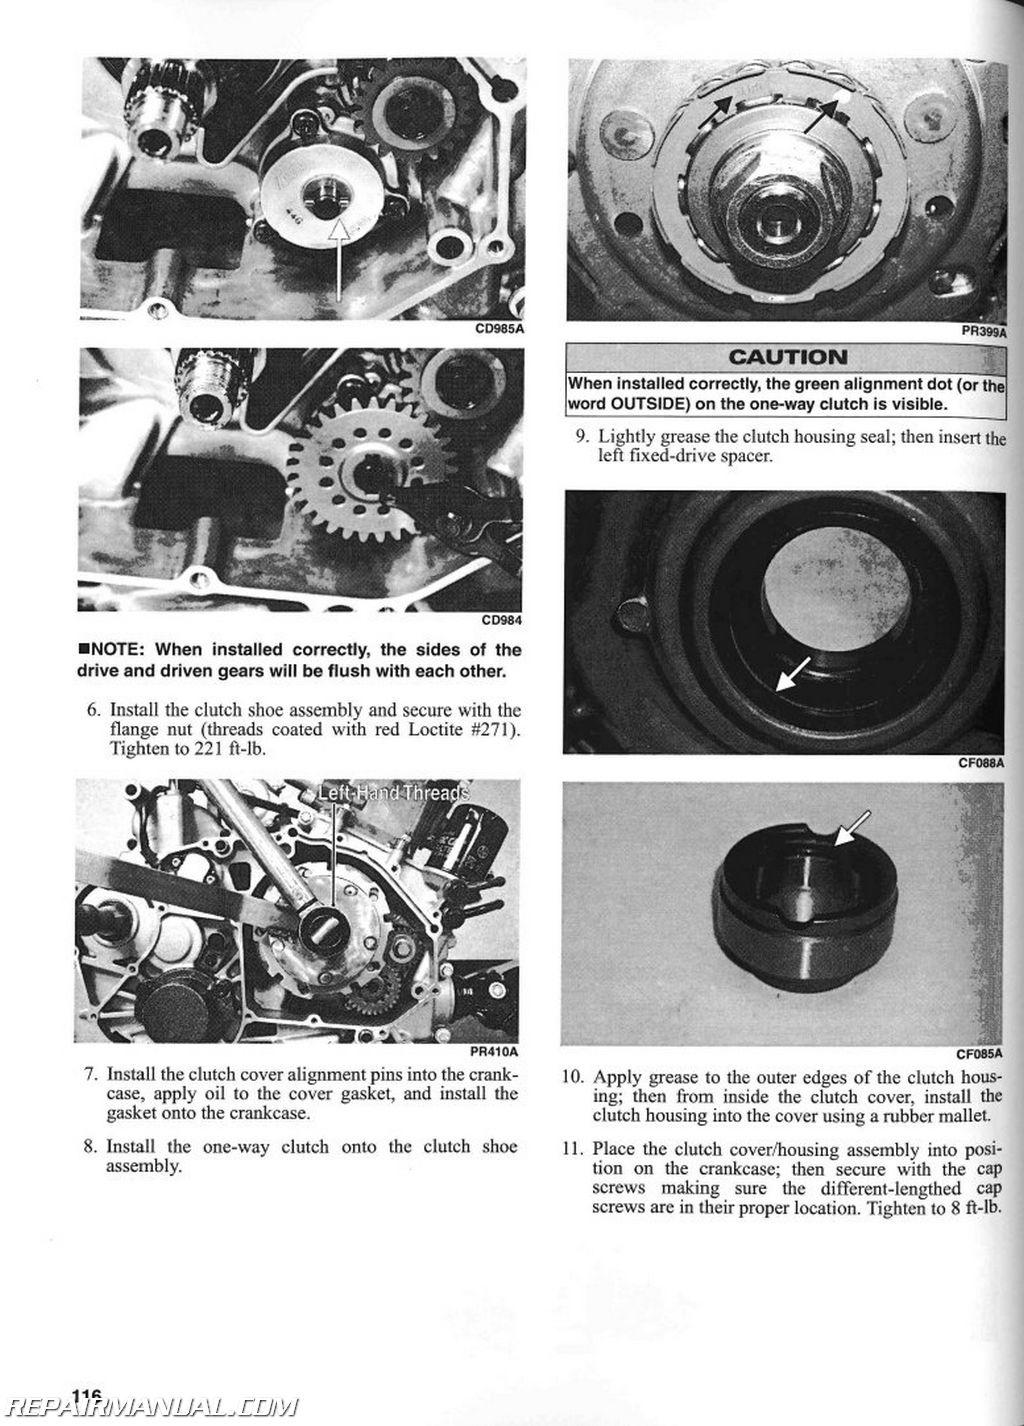 2014 rmz 250 service manual pdf